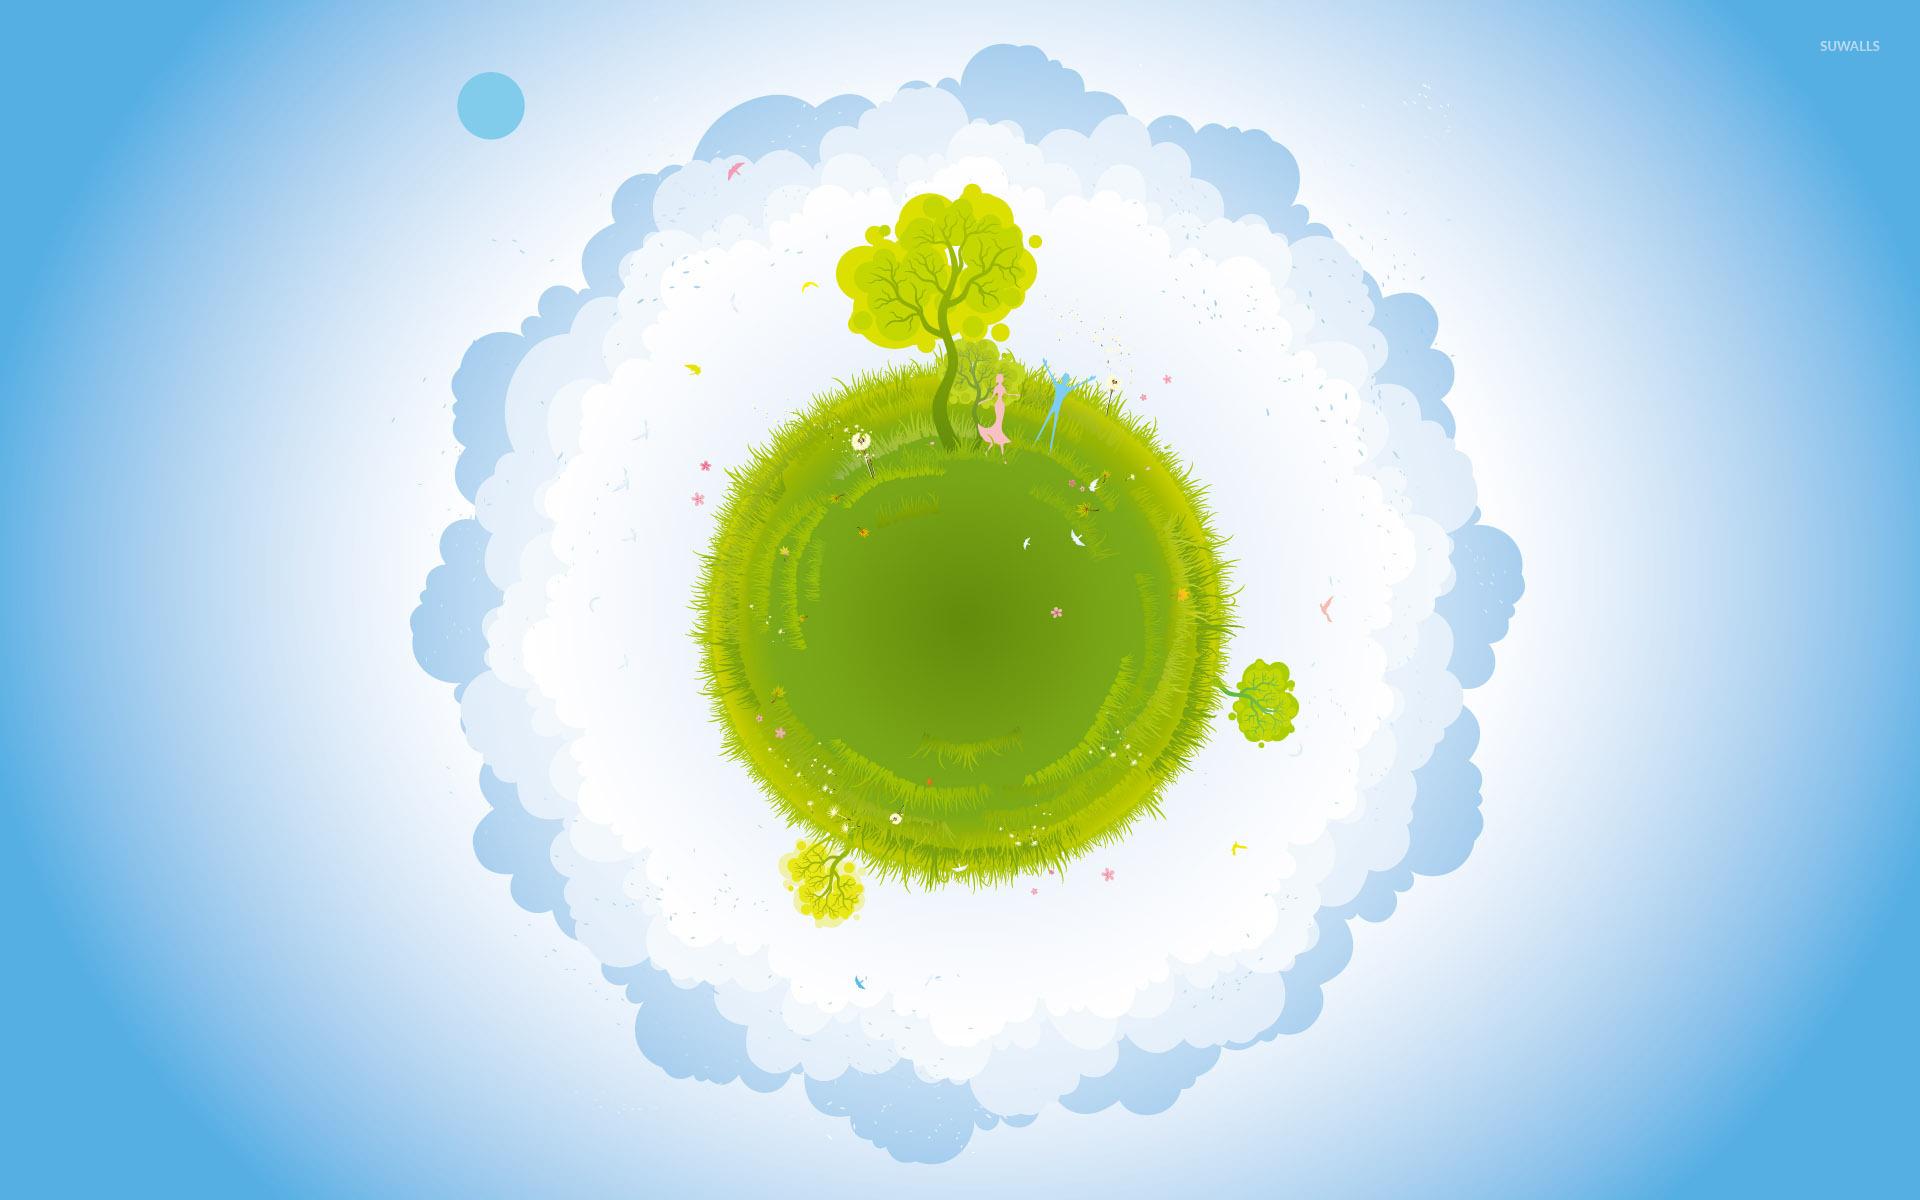 green planet wallpaper - vector wallpapers - #4890